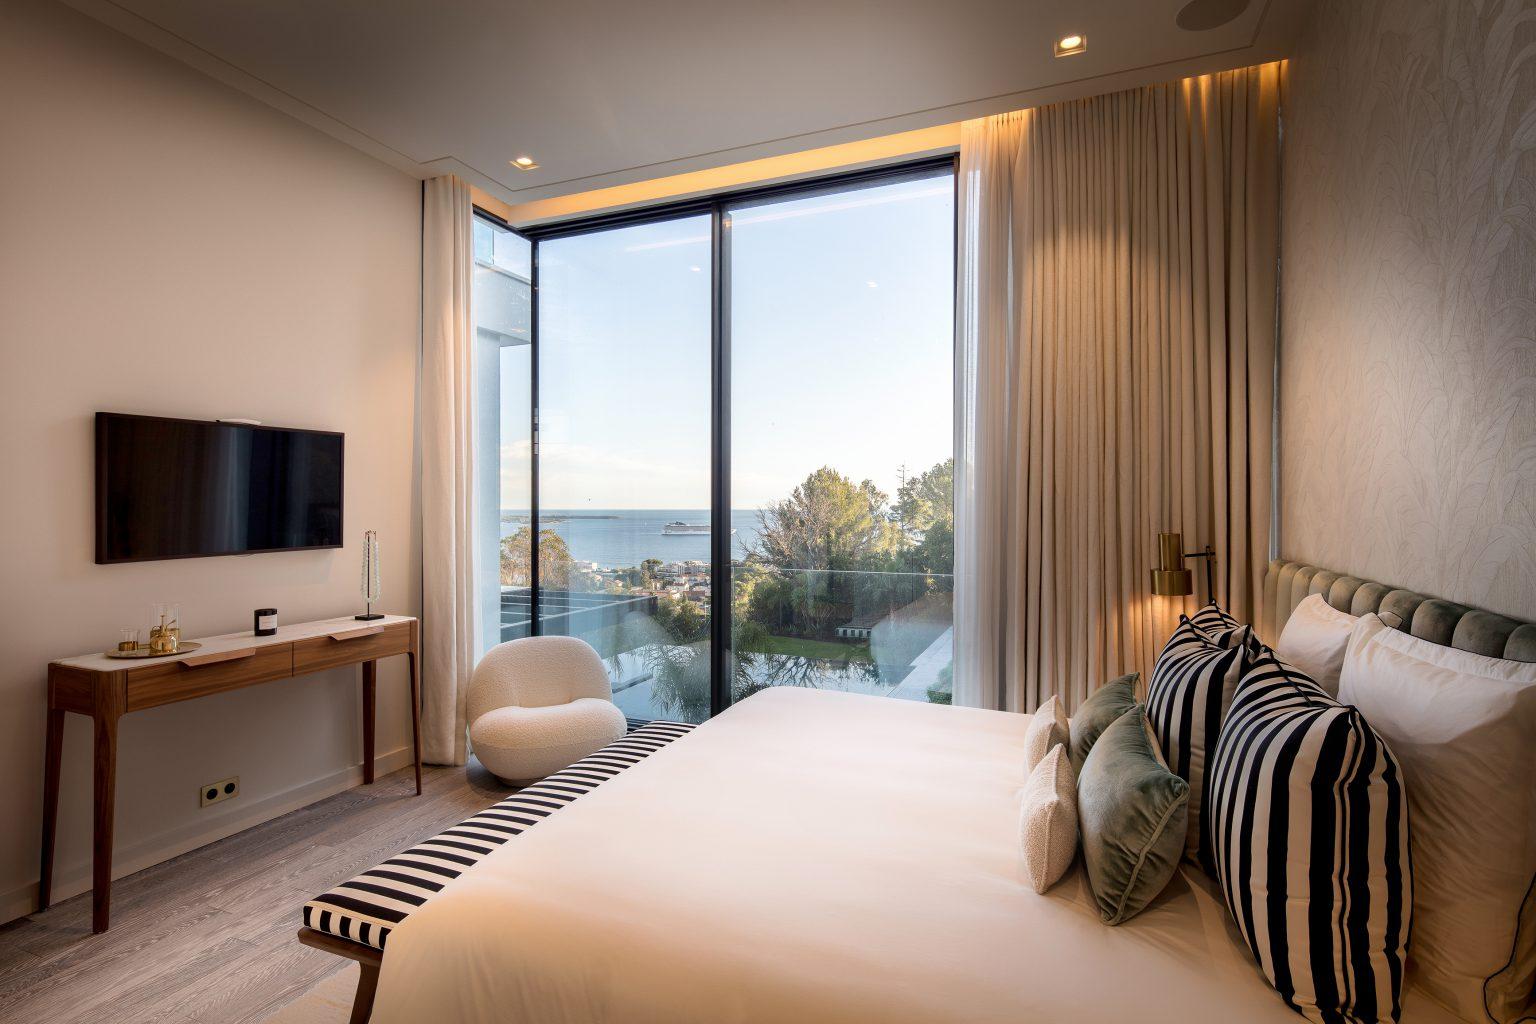 1_chambre king bed luxe villa design